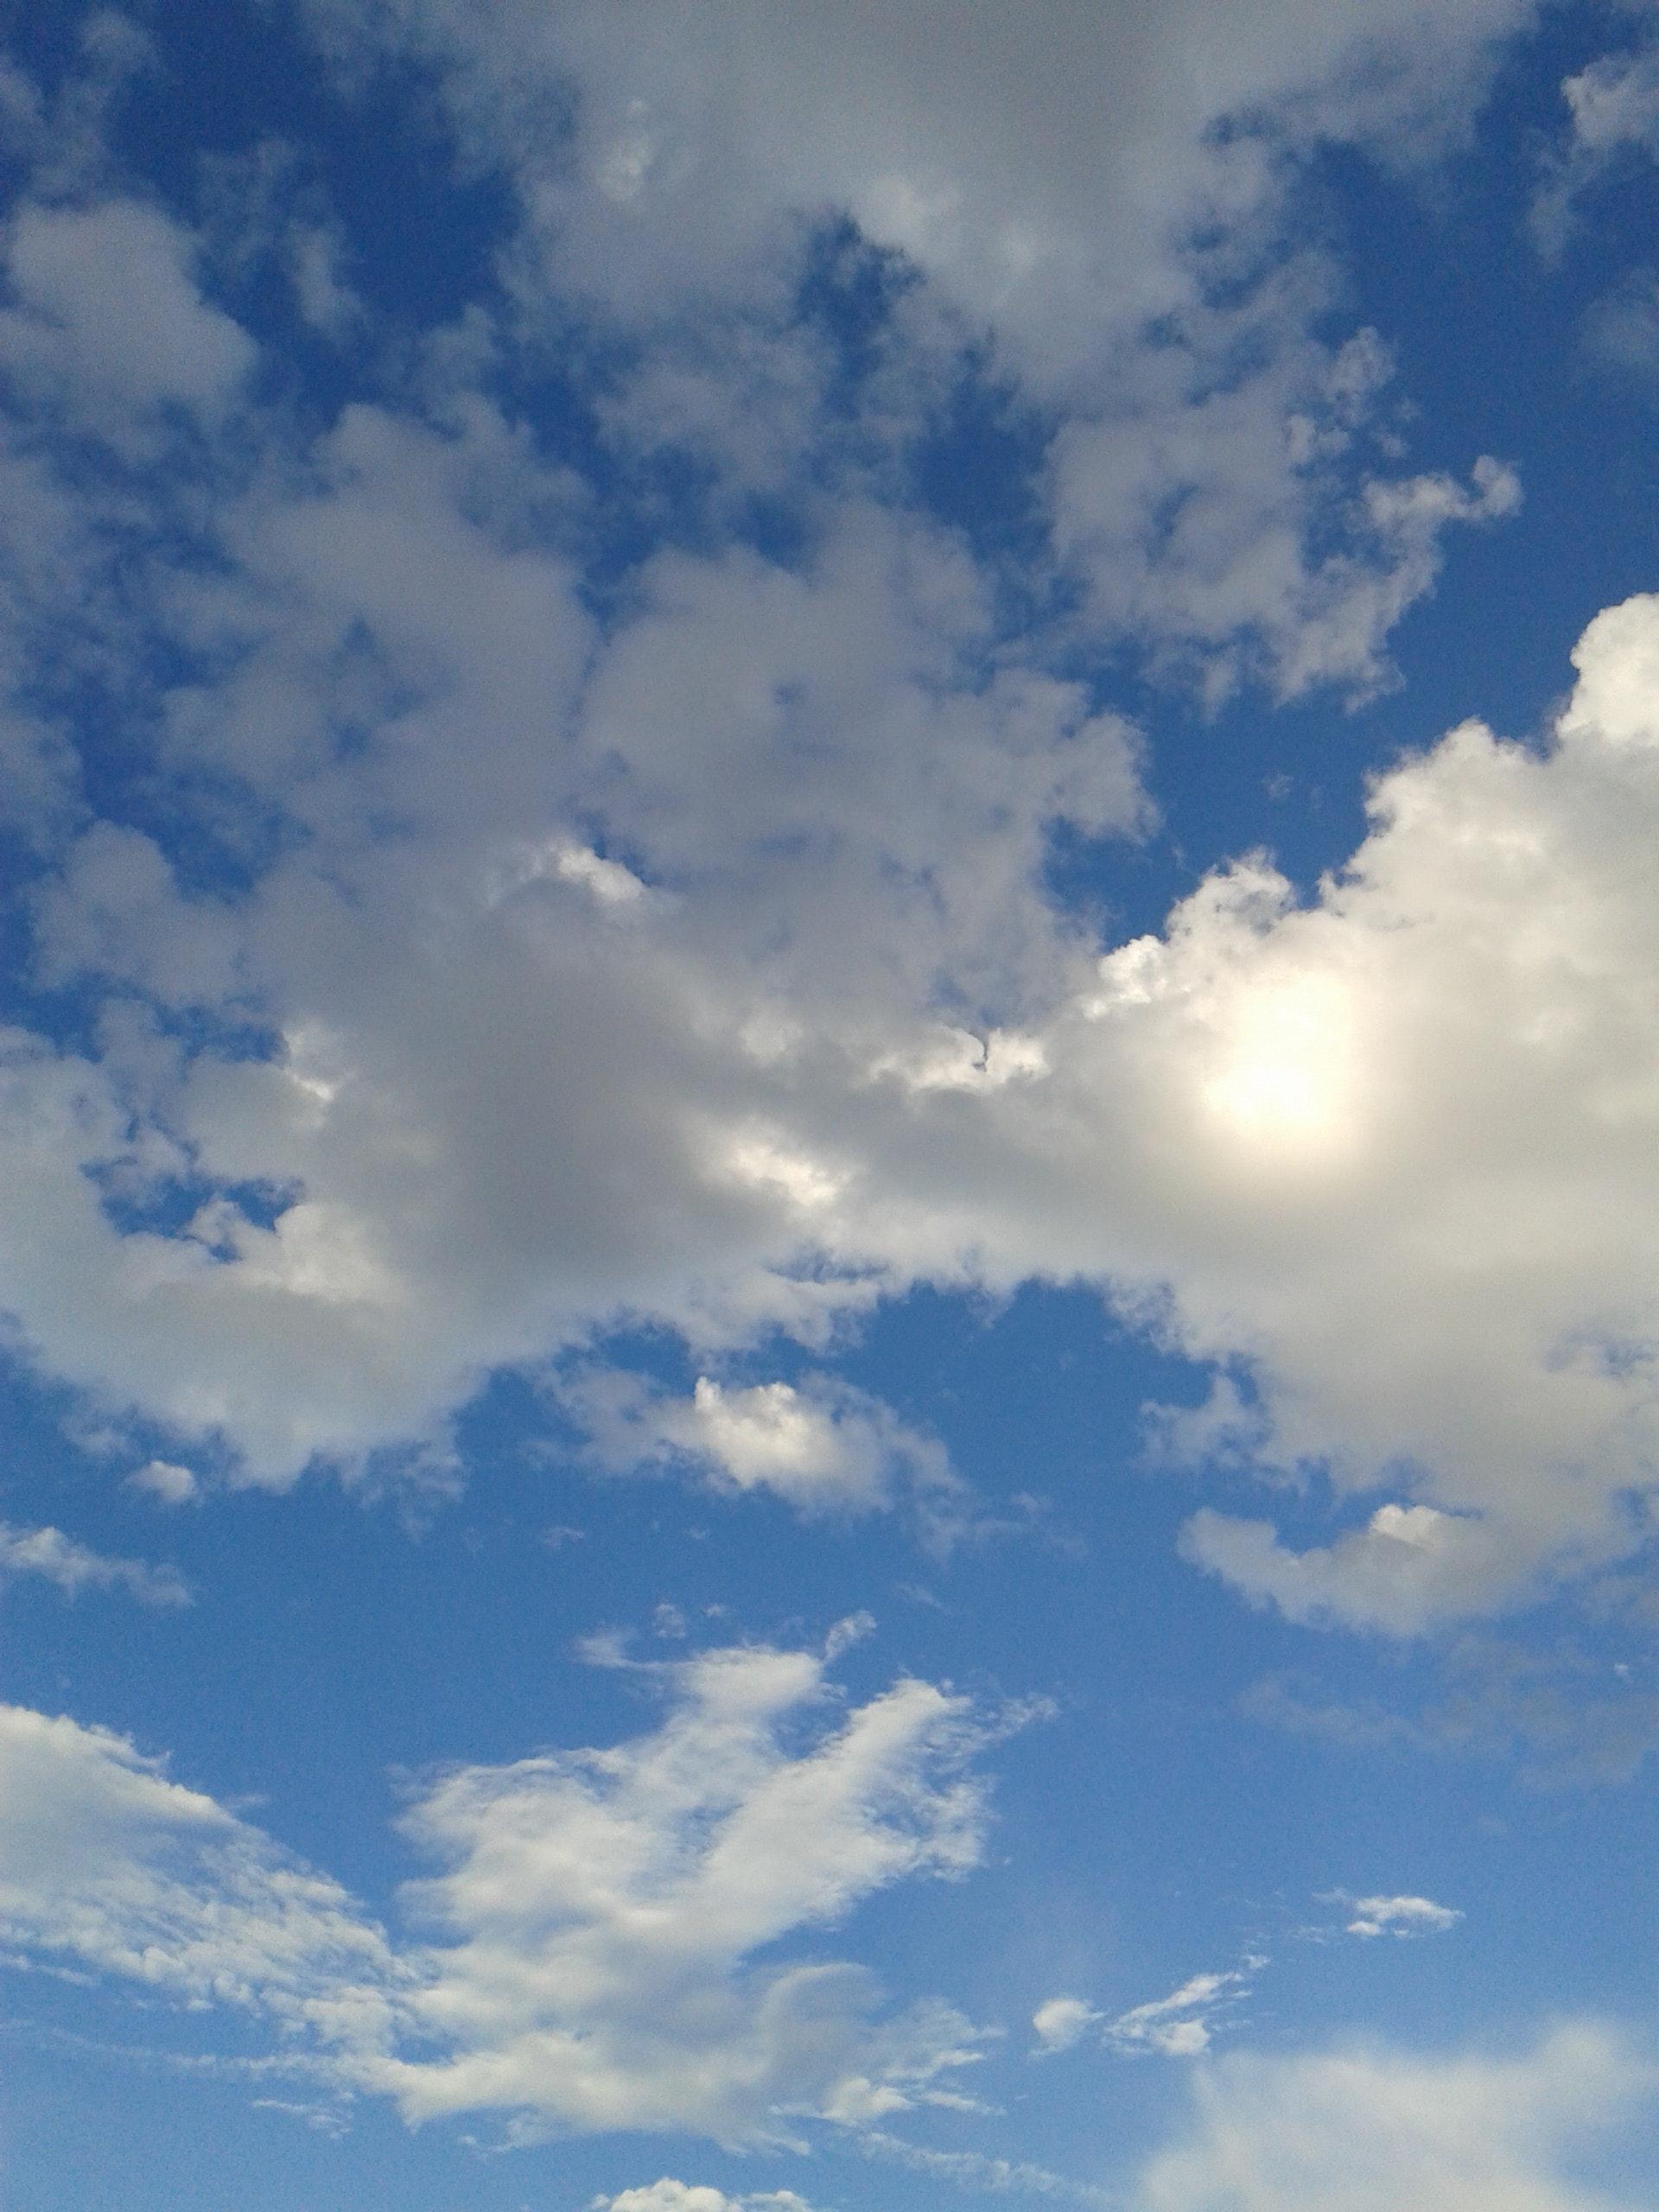 wallpaper awan,sky,cloud,blue,daytime,cumulus,atmosphere ...